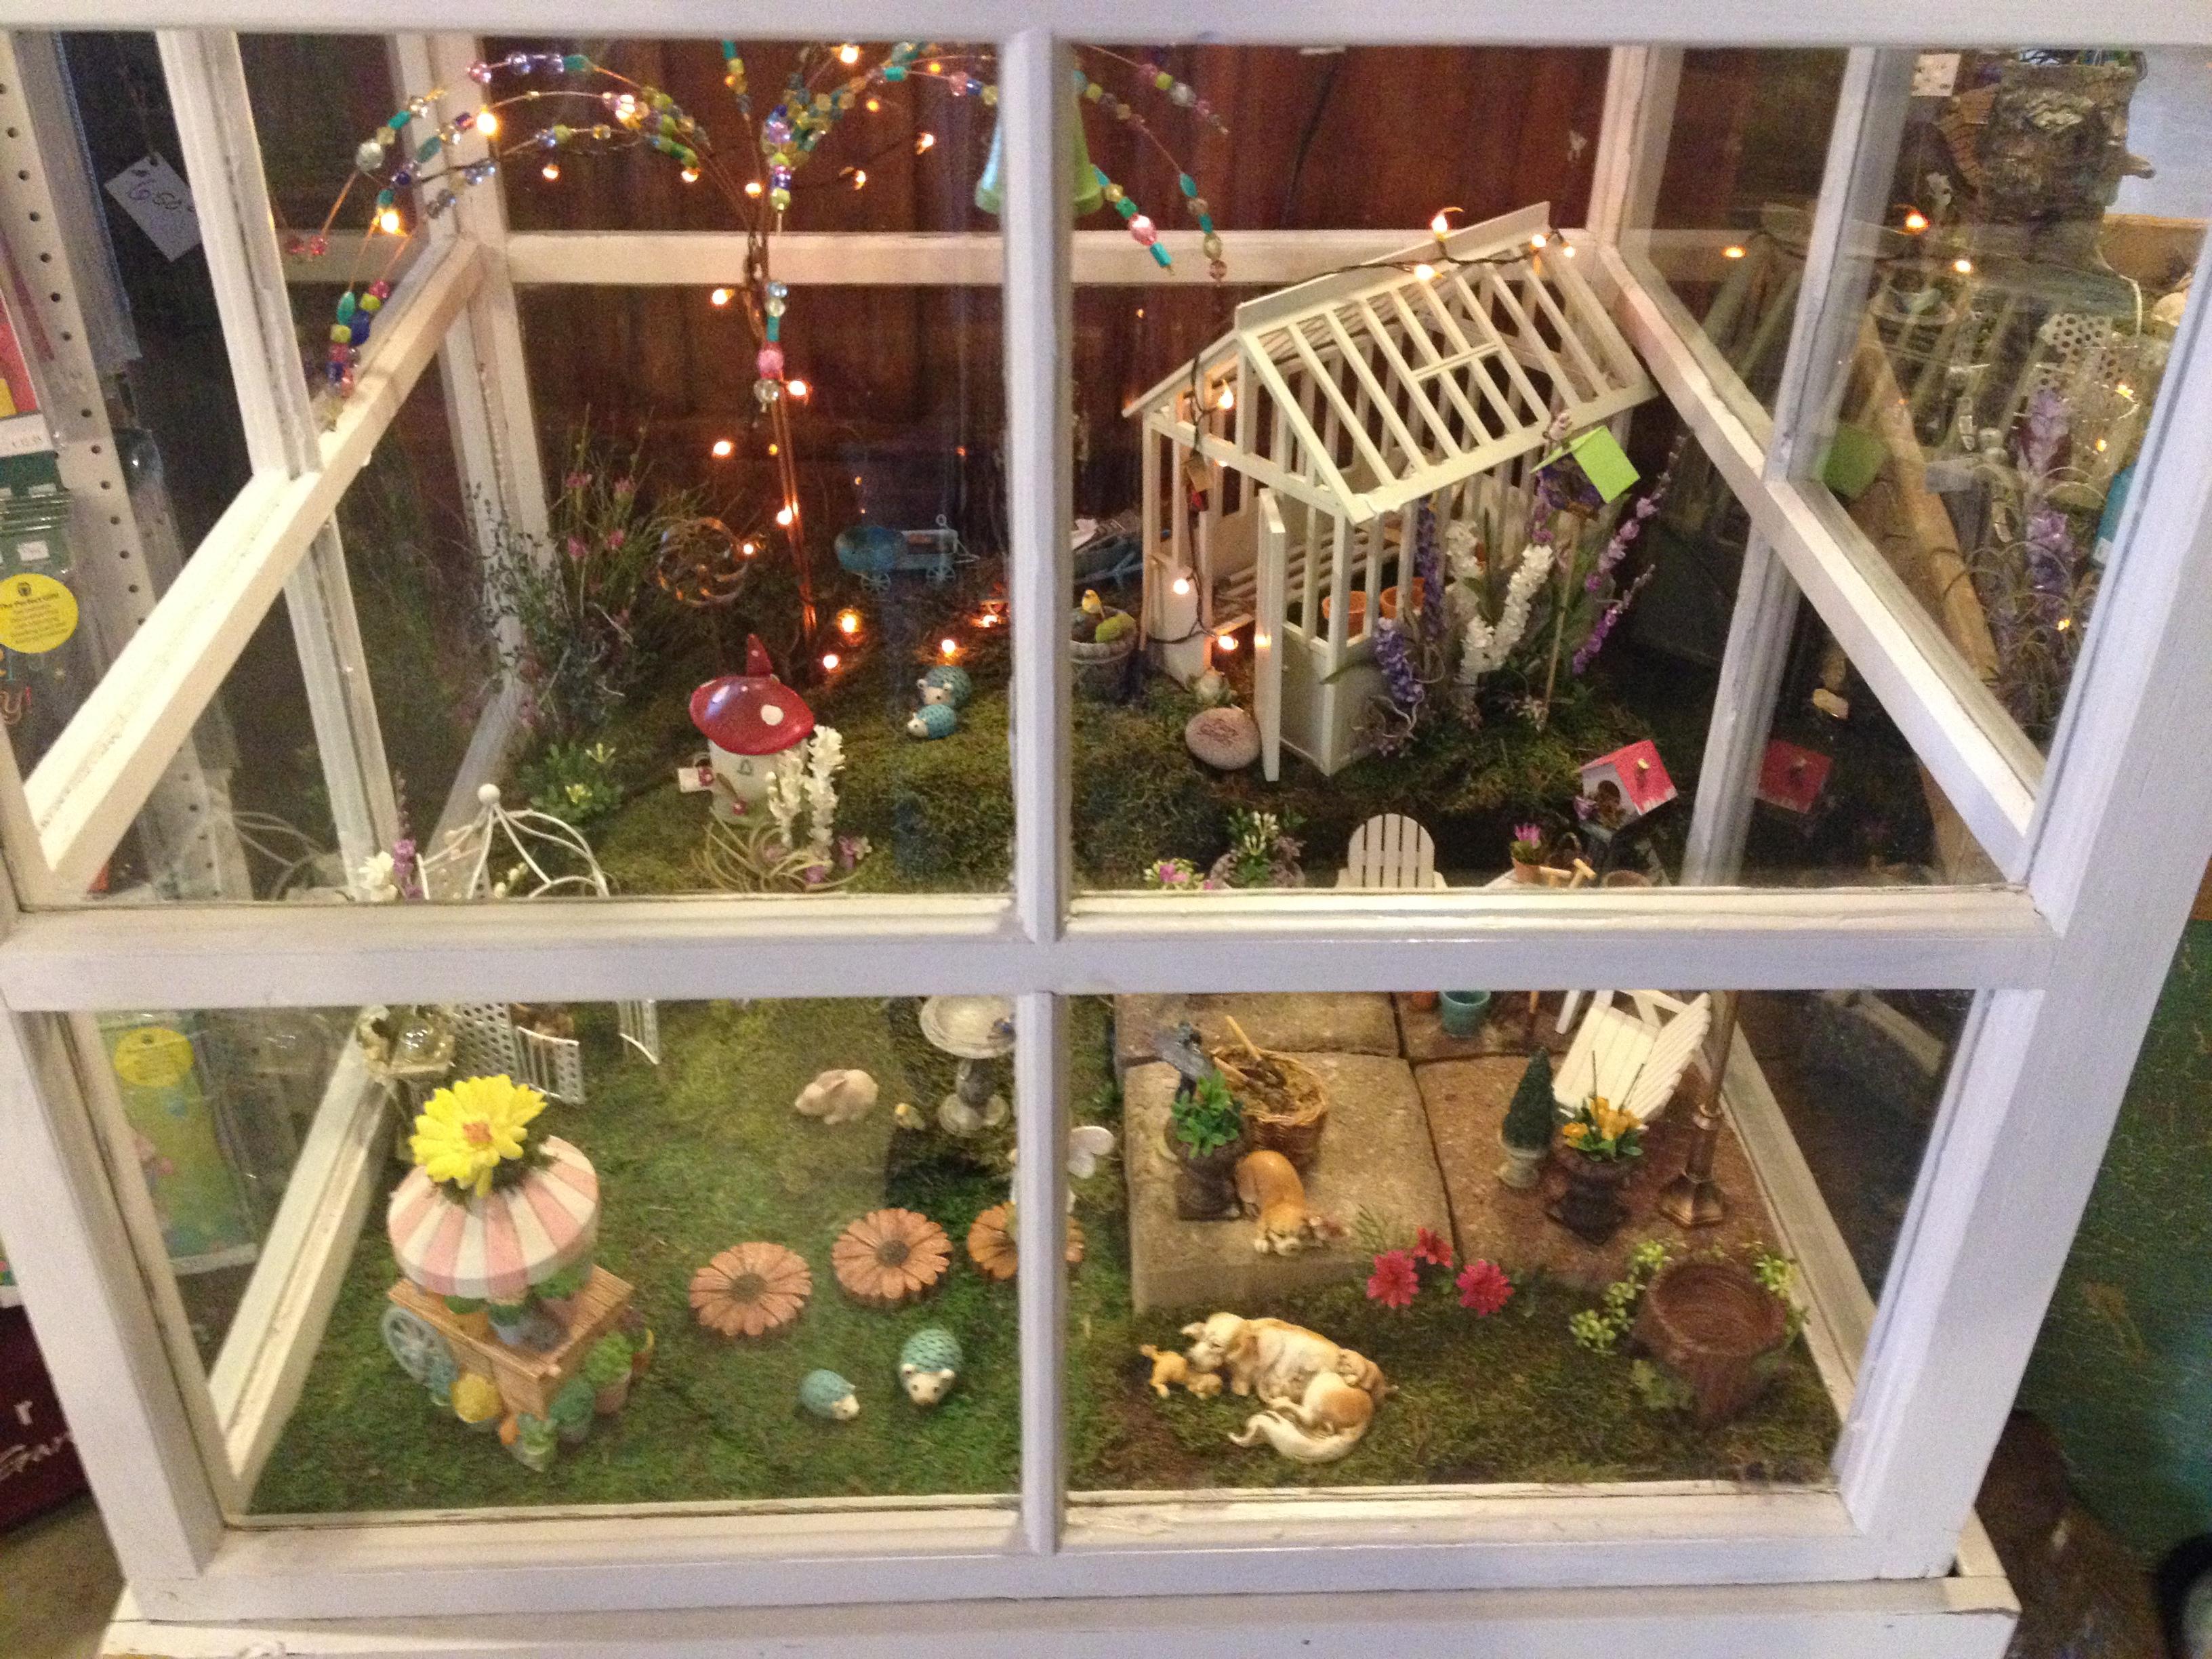 Fullsize Of Outdoor Miniature Garden